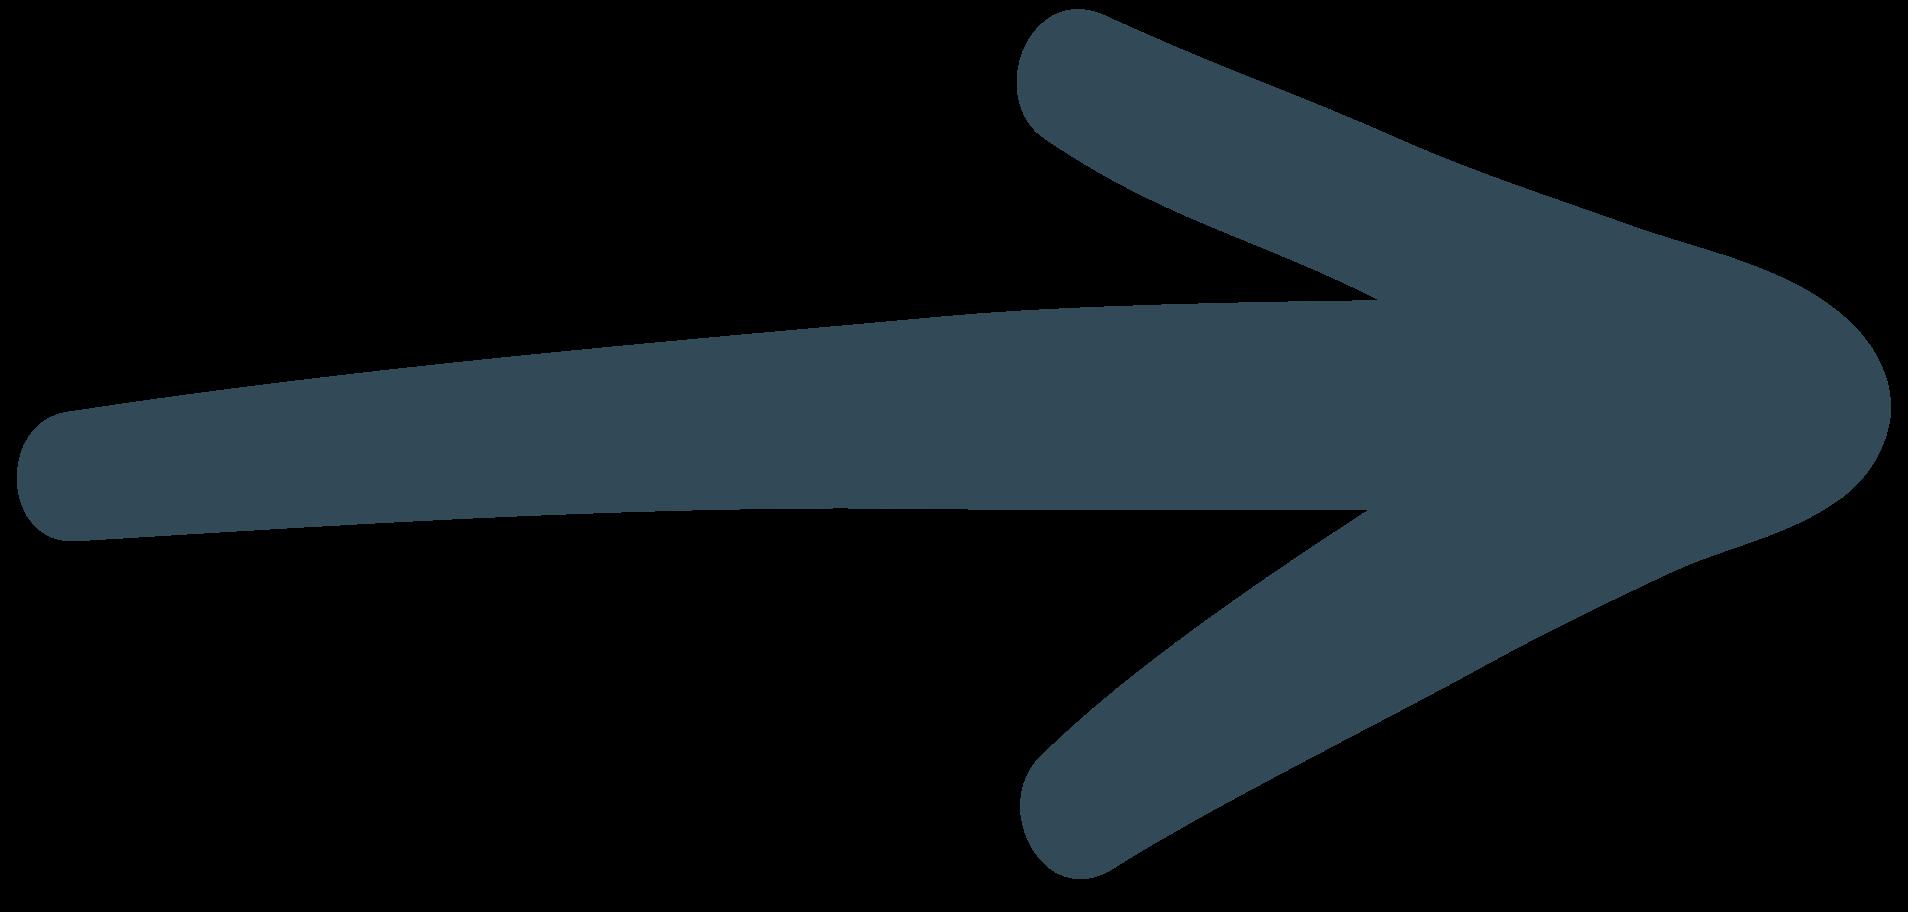 arrow darl blue Clipart illustration in PNG, SVG